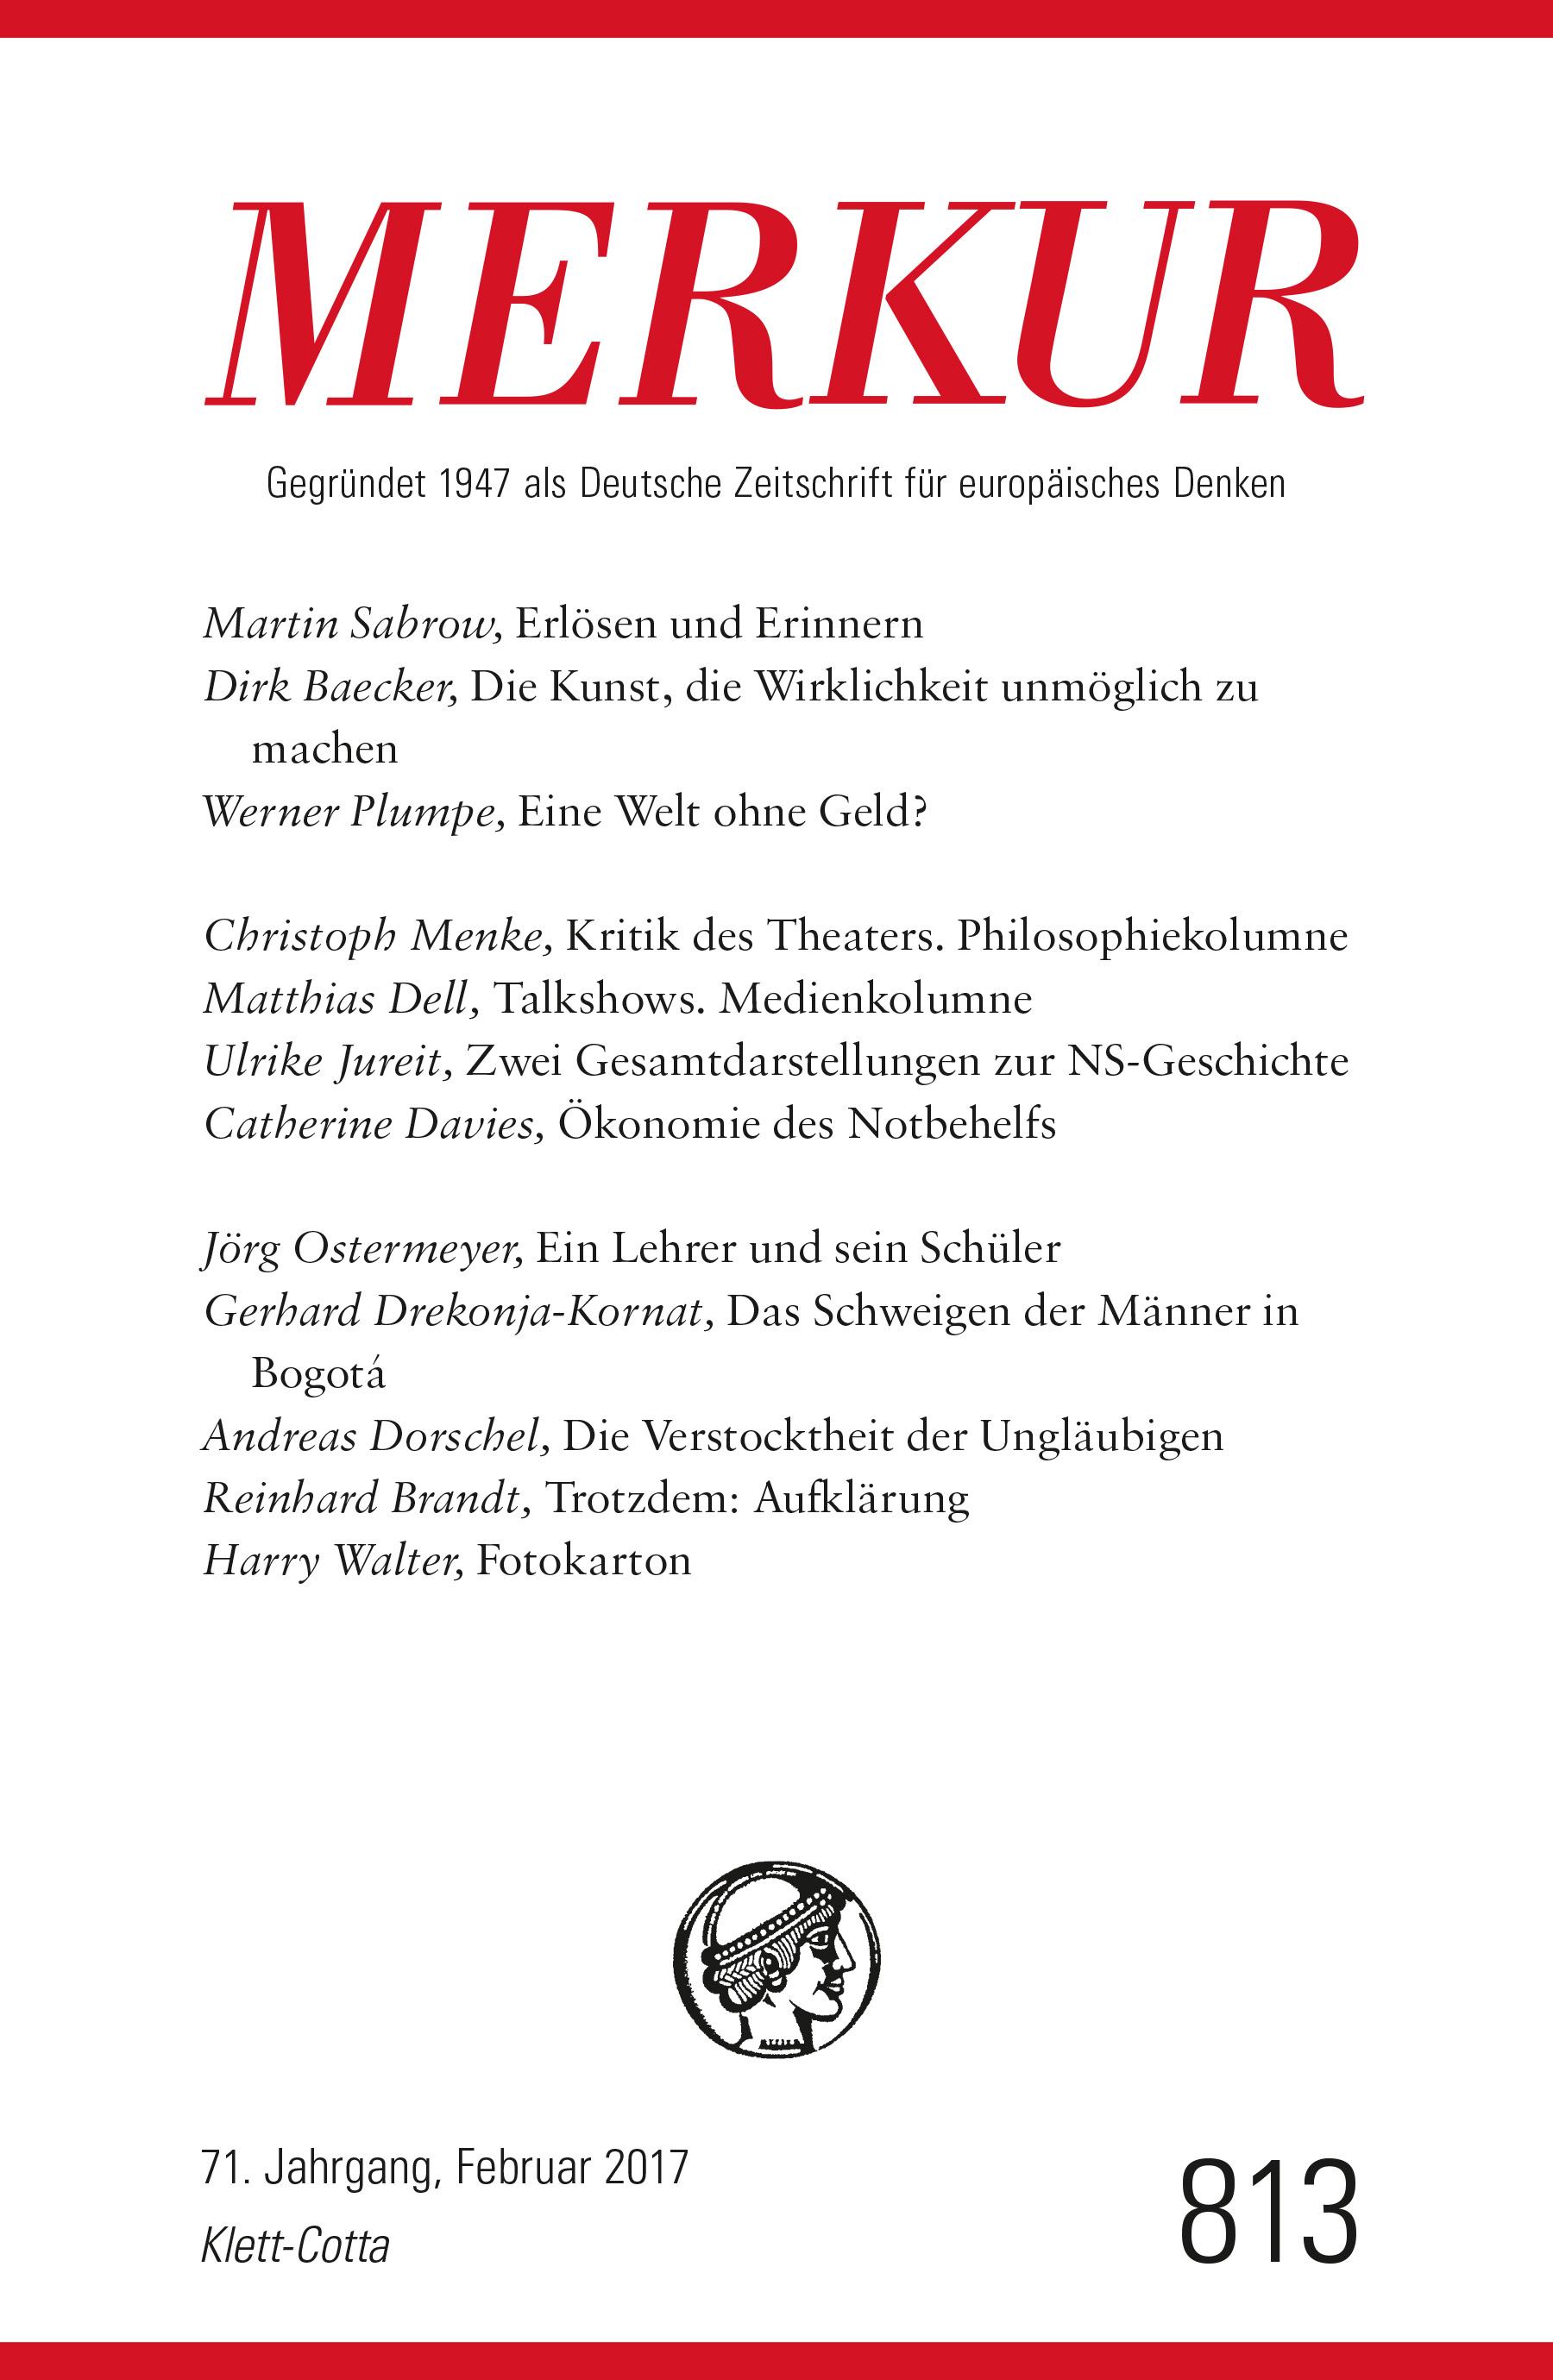 merkur cover 2/2017